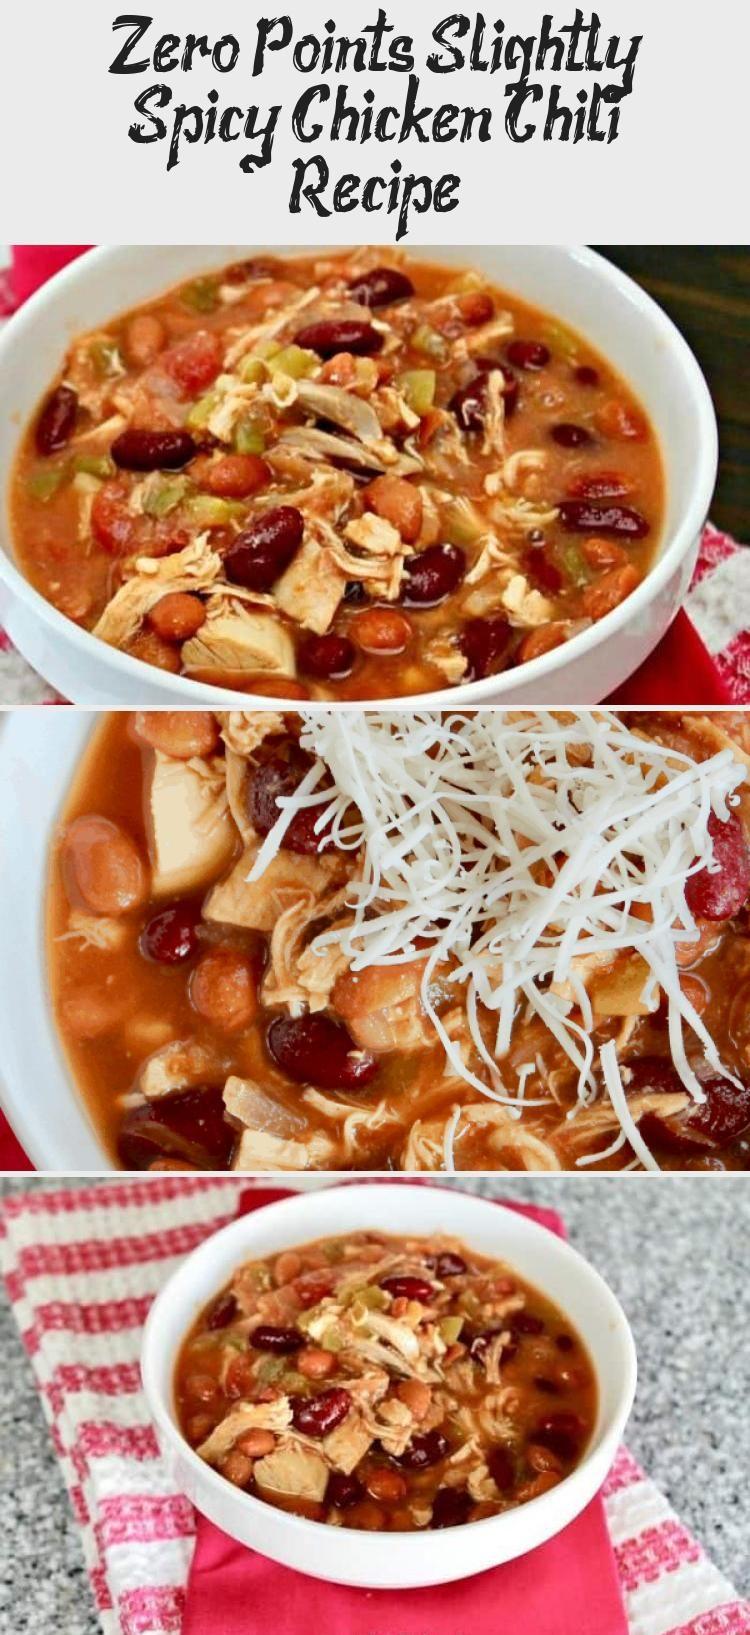 Zero Points Slightly Spicy Chicken Chili Recipe Diabet